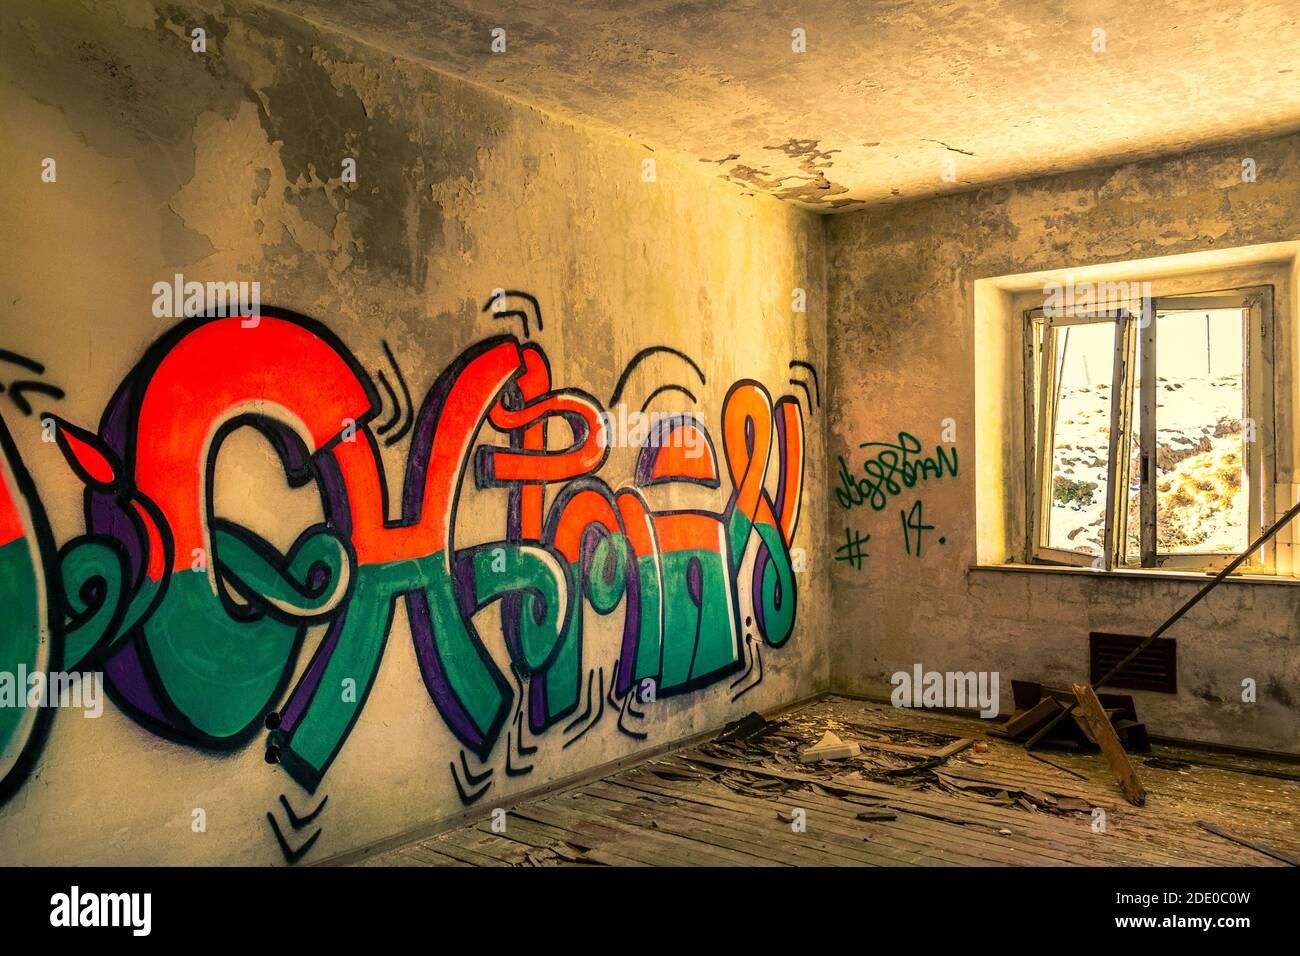 Habitación desbocada con ventana rota, suelo de madera destruido, paredes de graffiti multicolores. Interior de edificio abandonado. Monte Grappa, Vicenza, Italia Foto de stock